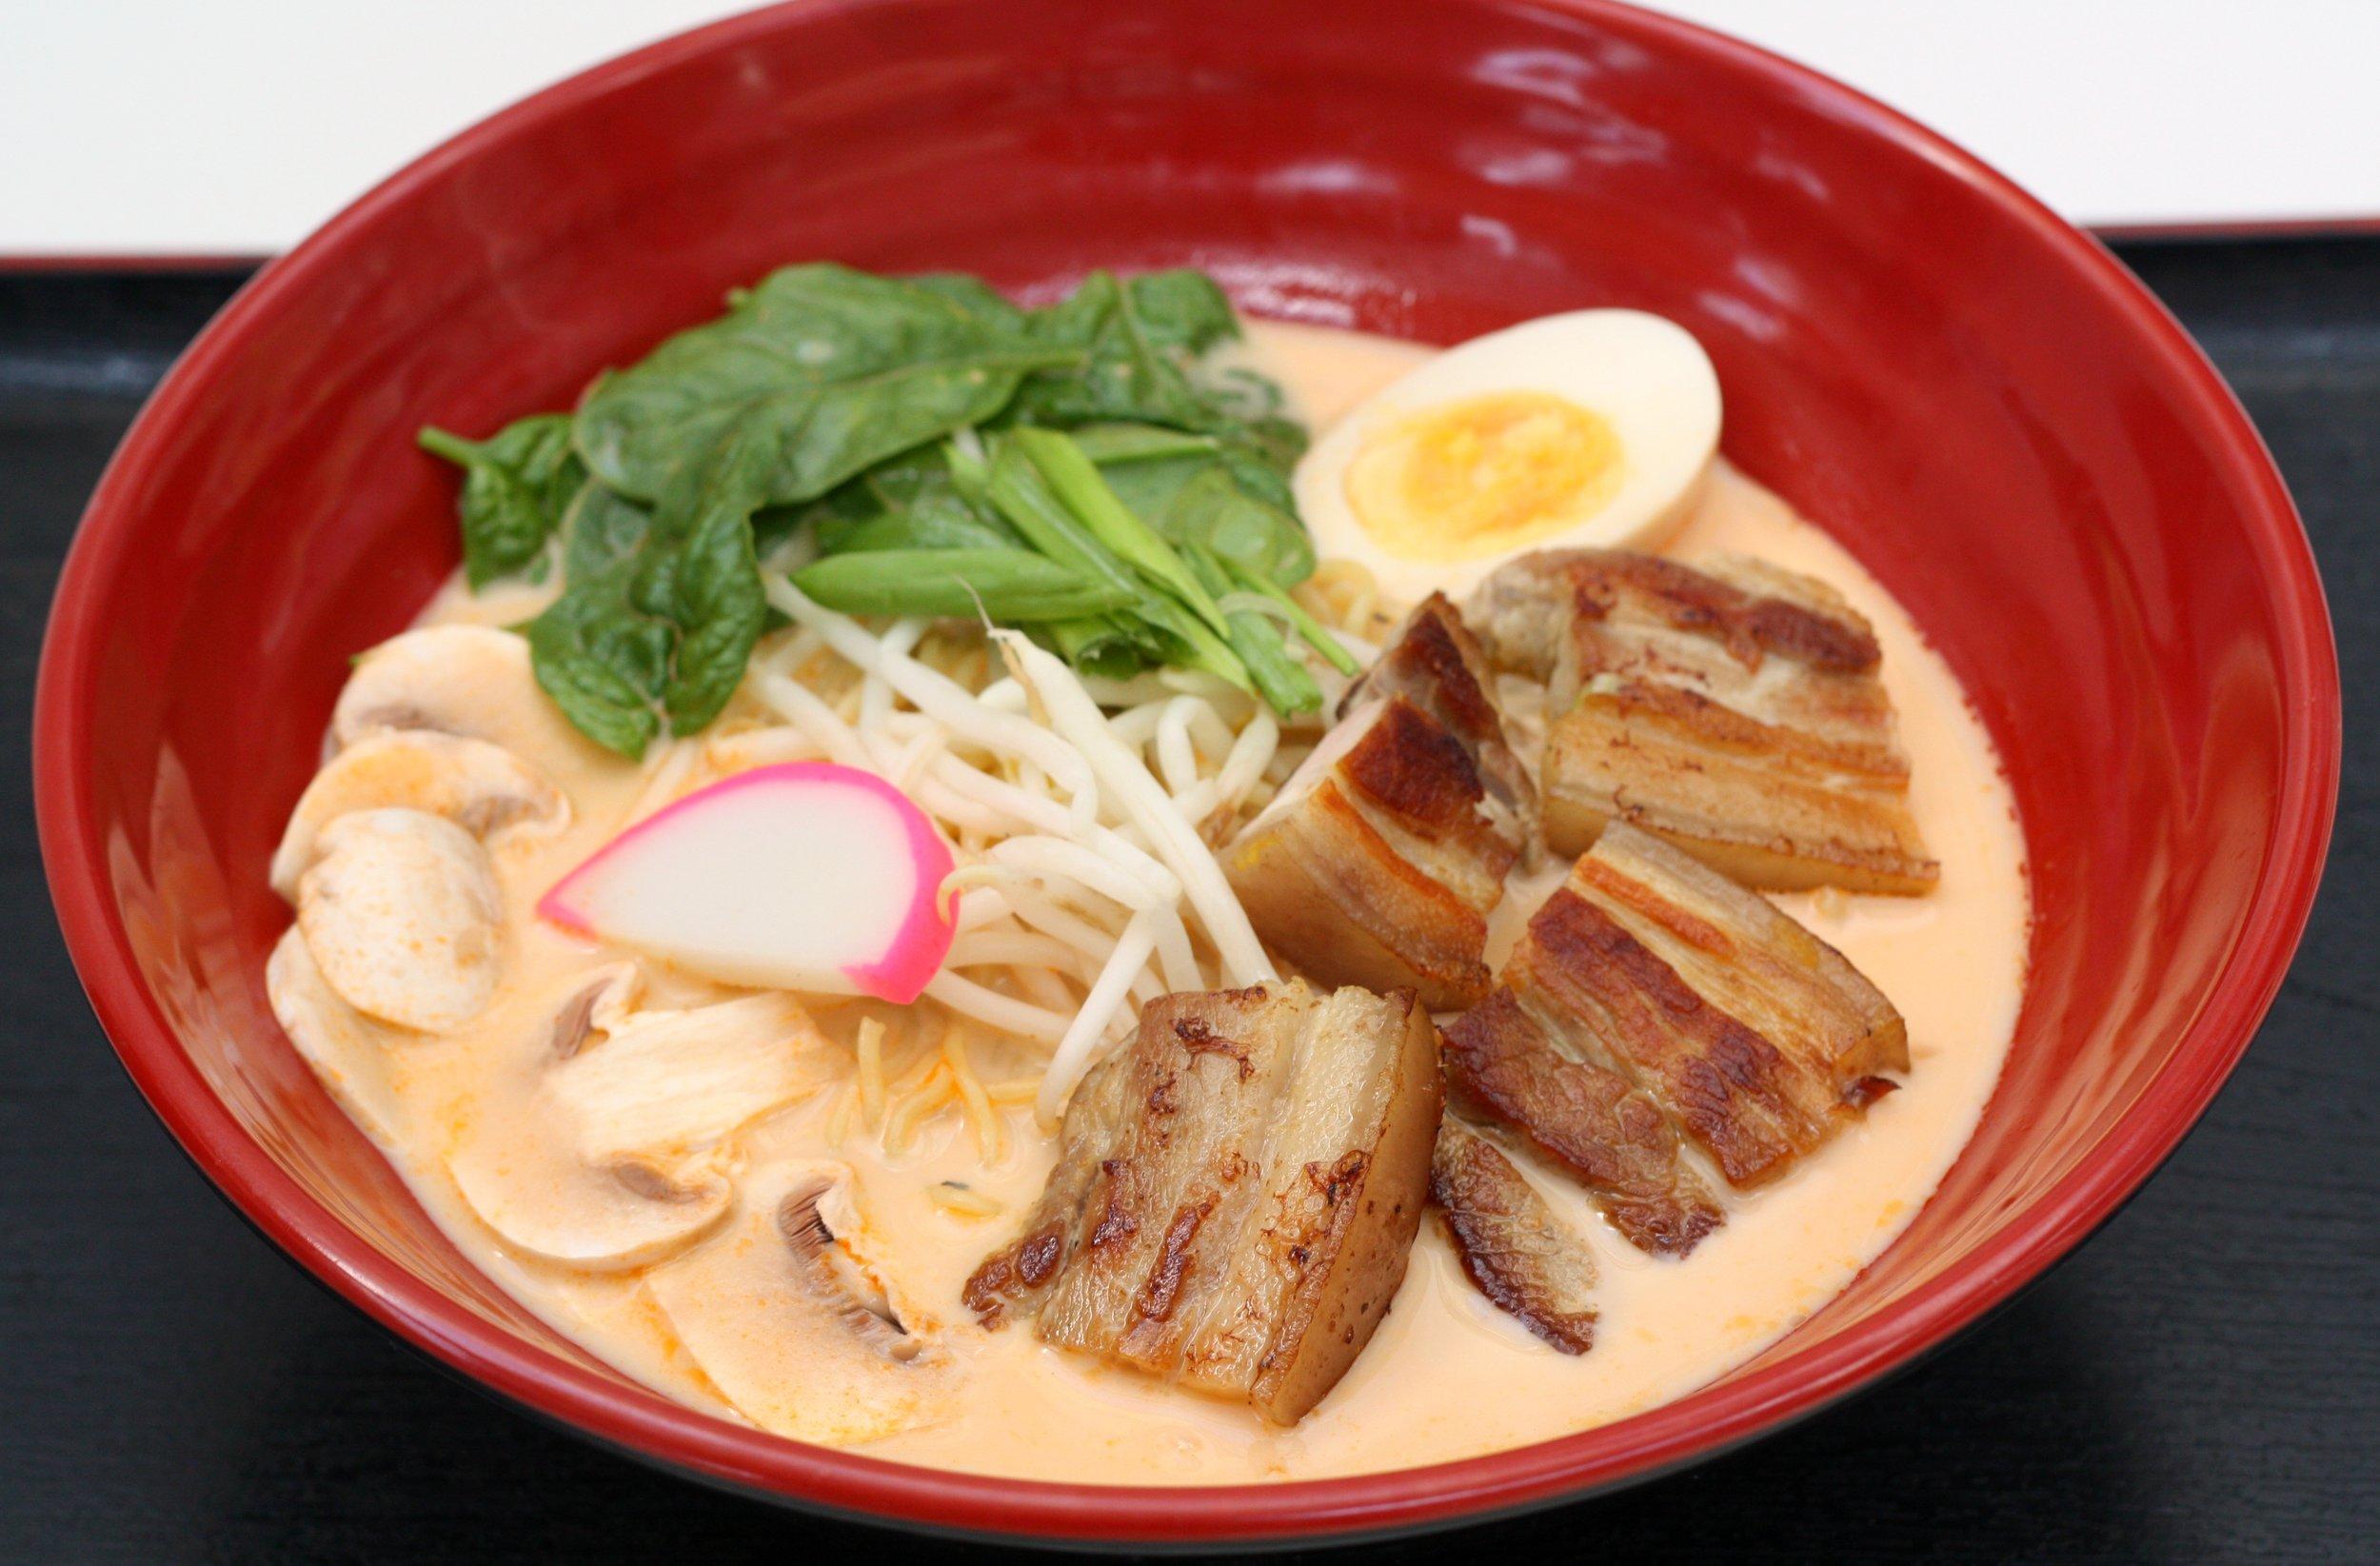 Mad_Spicy_Ramen_San_Francisco_Japanese_Restaurant_Kui_Shin_Bo.jpg